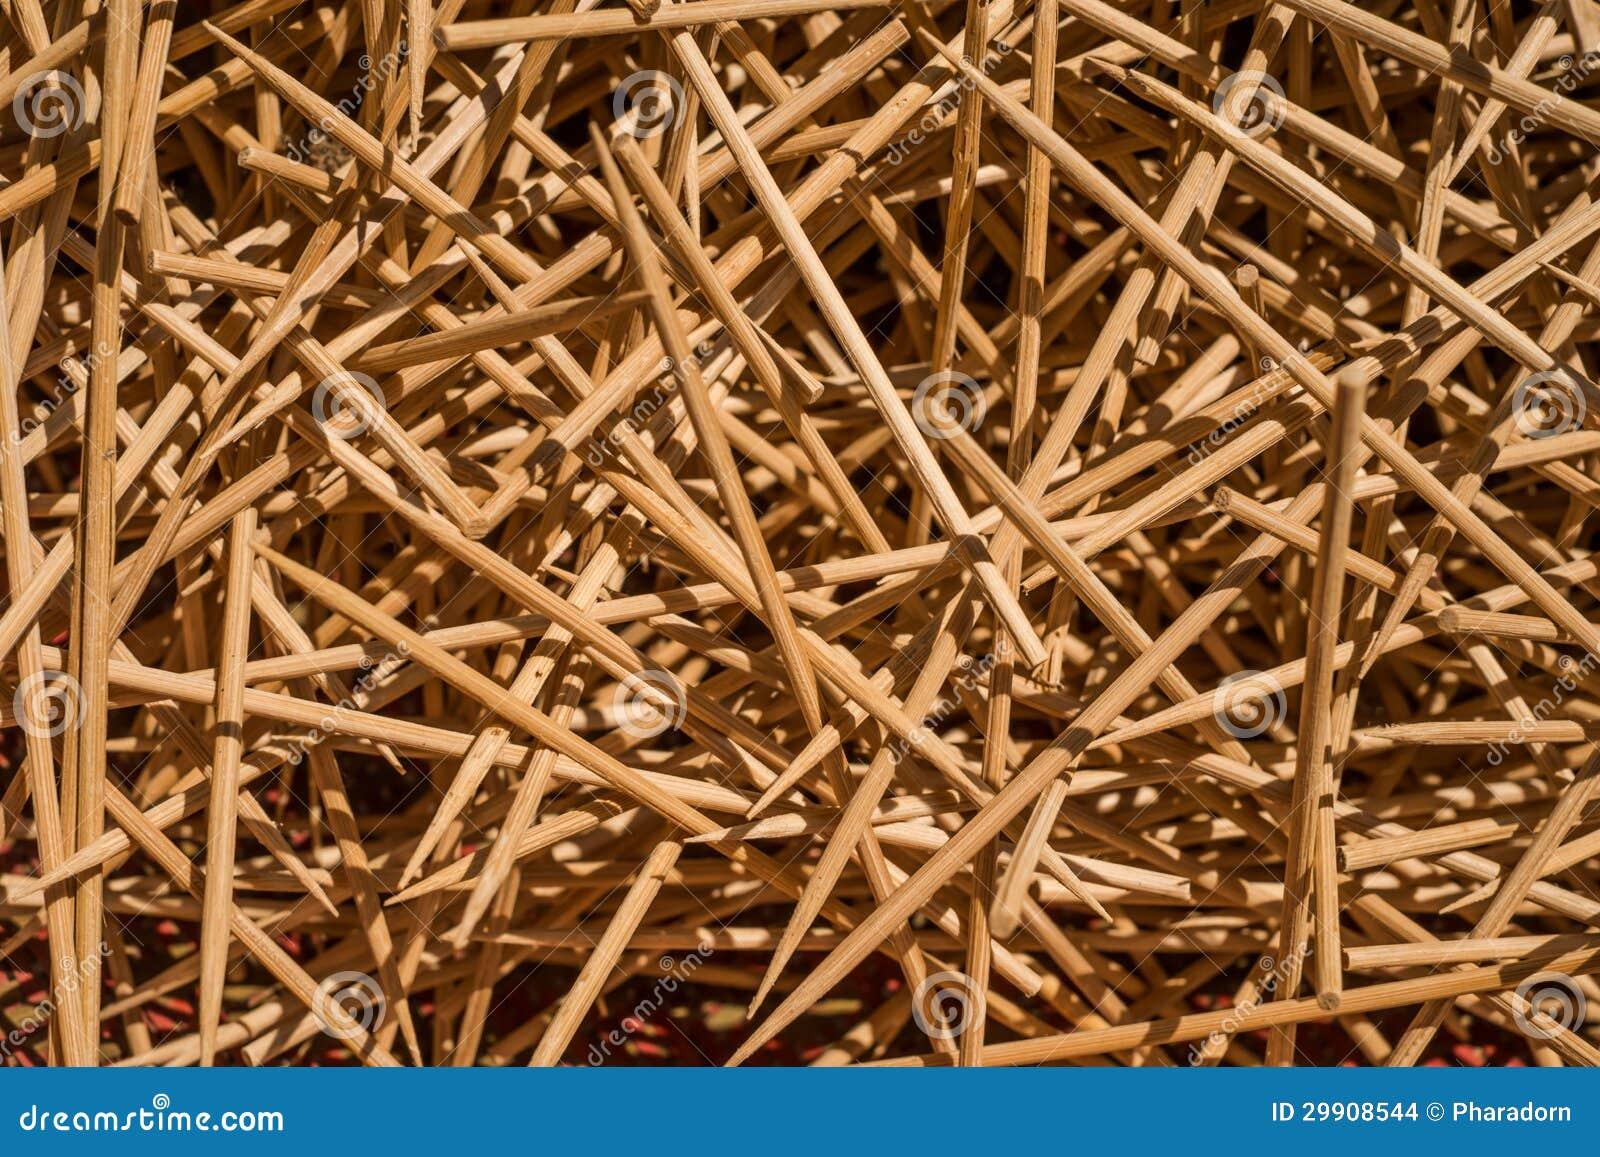 Bamboo Stcik People ~ Bamboo stick stock images image